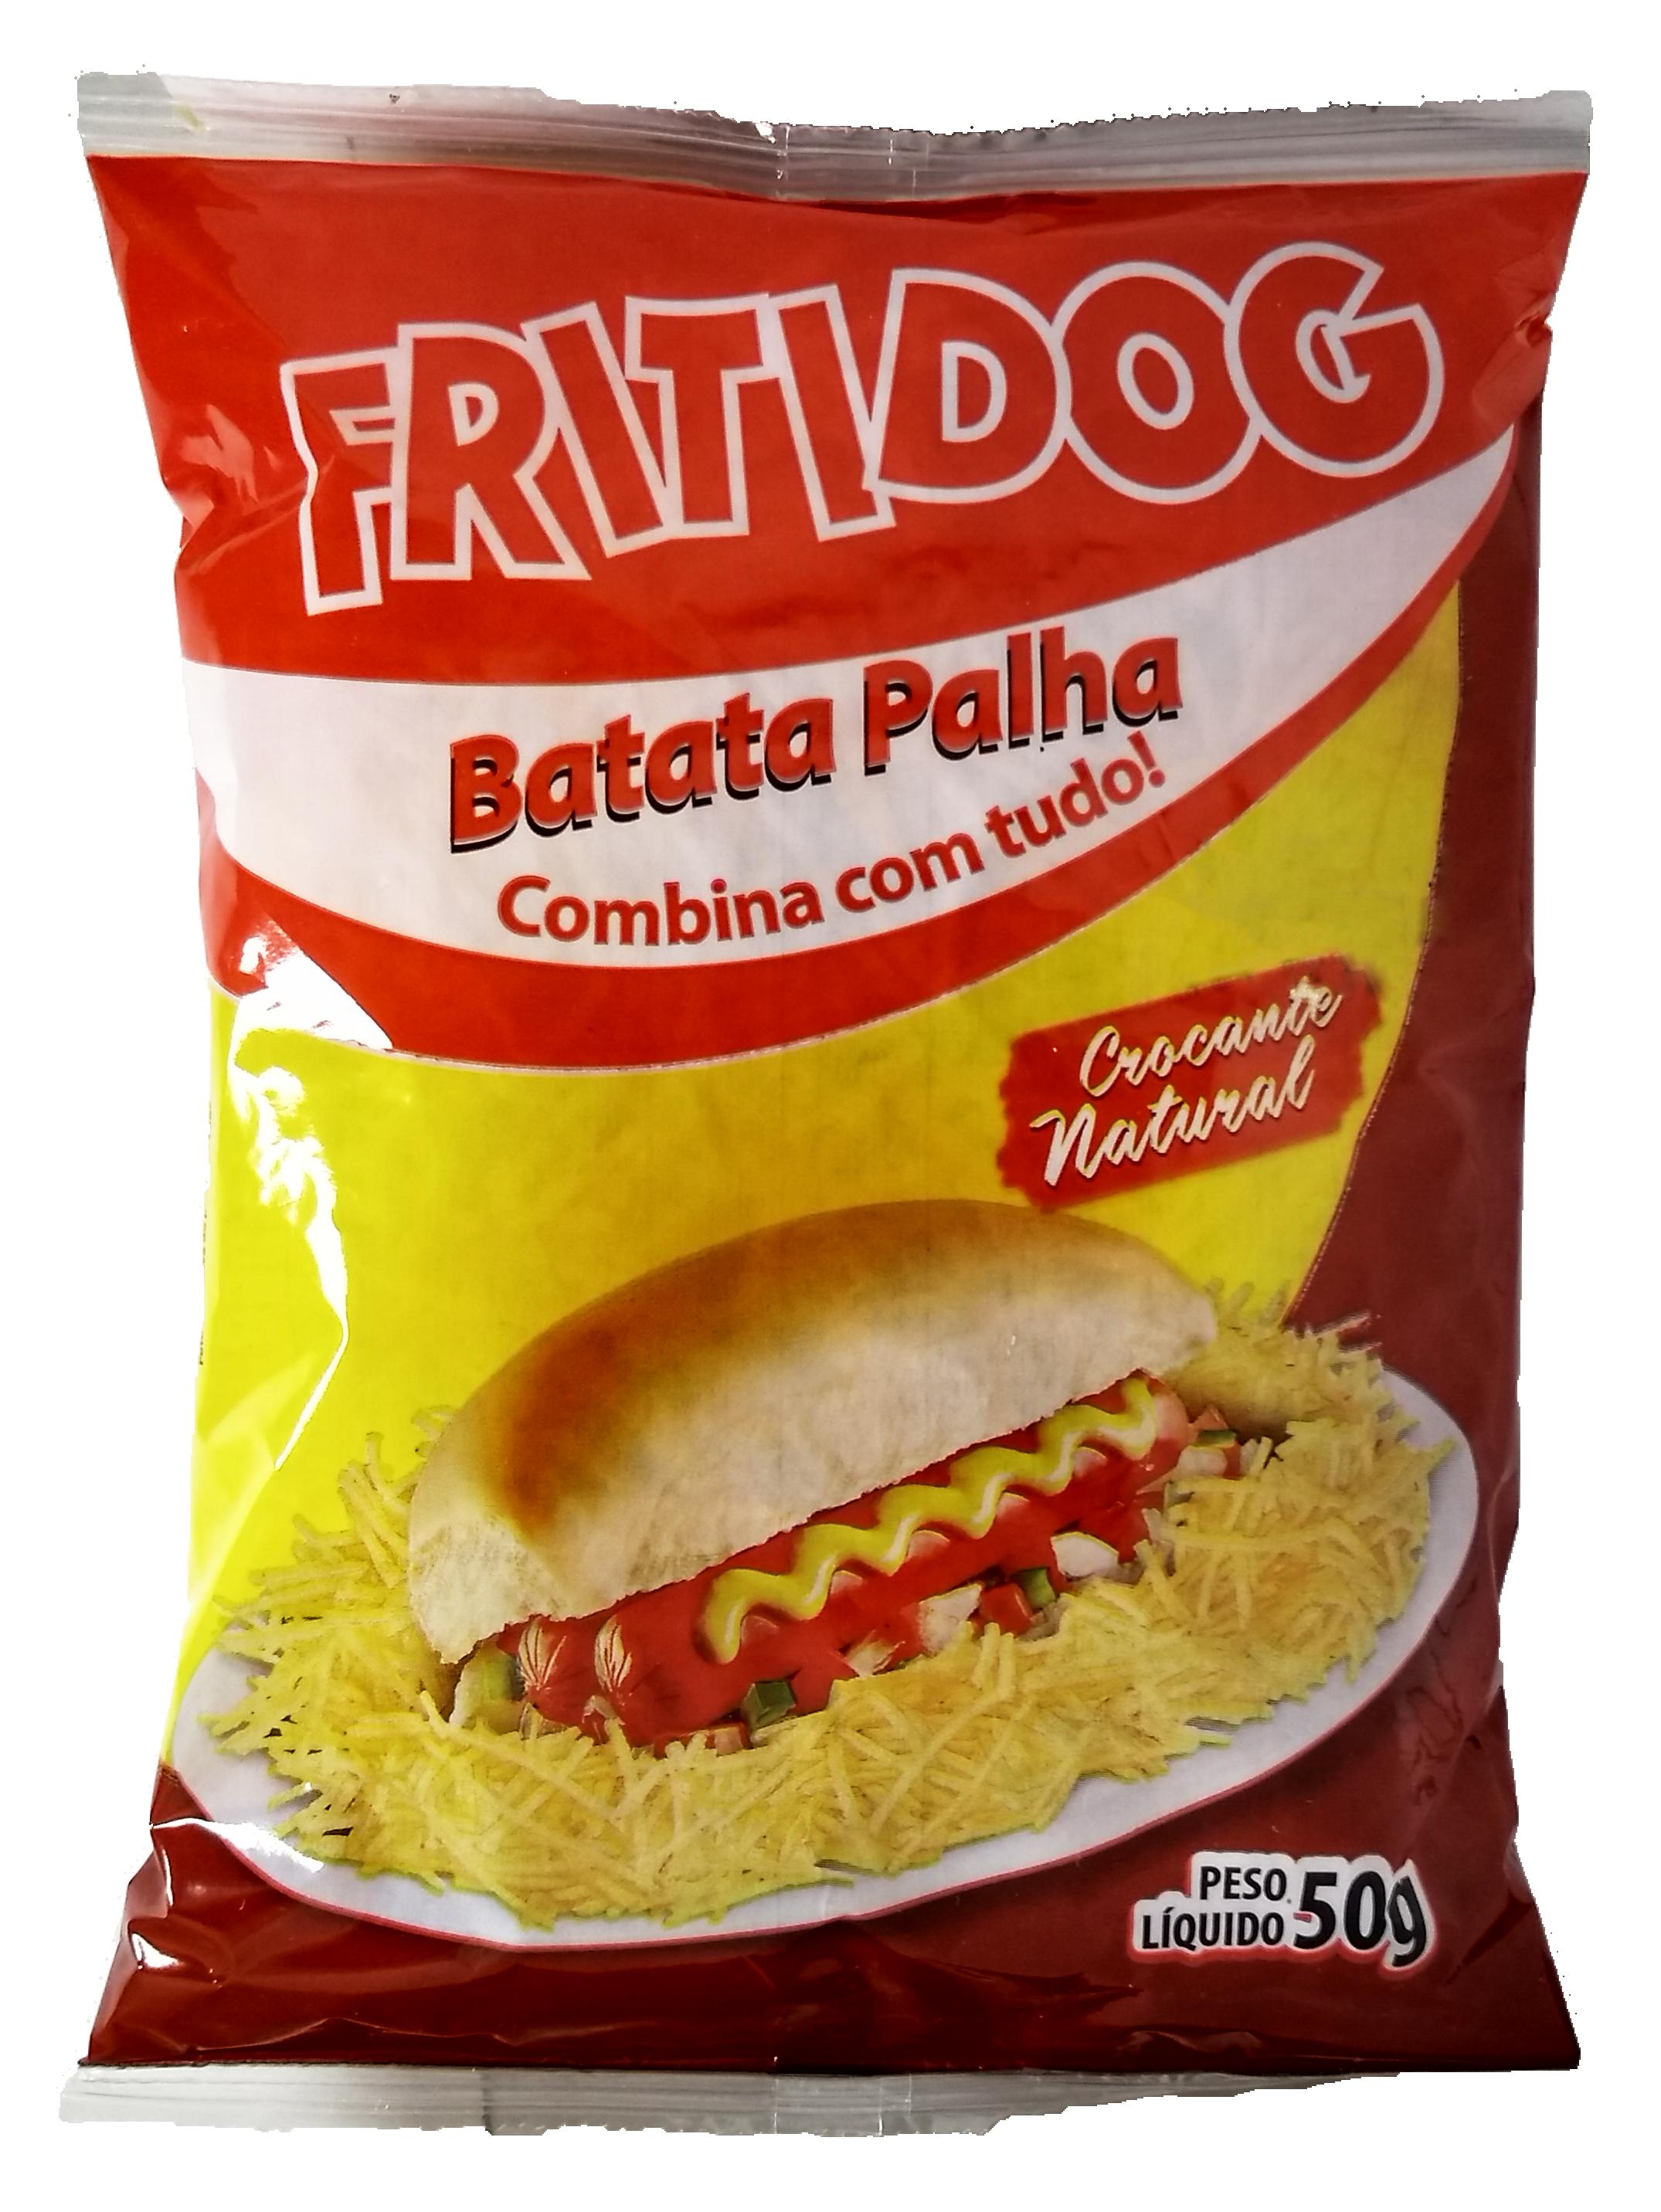 Fritidog Batata Palha